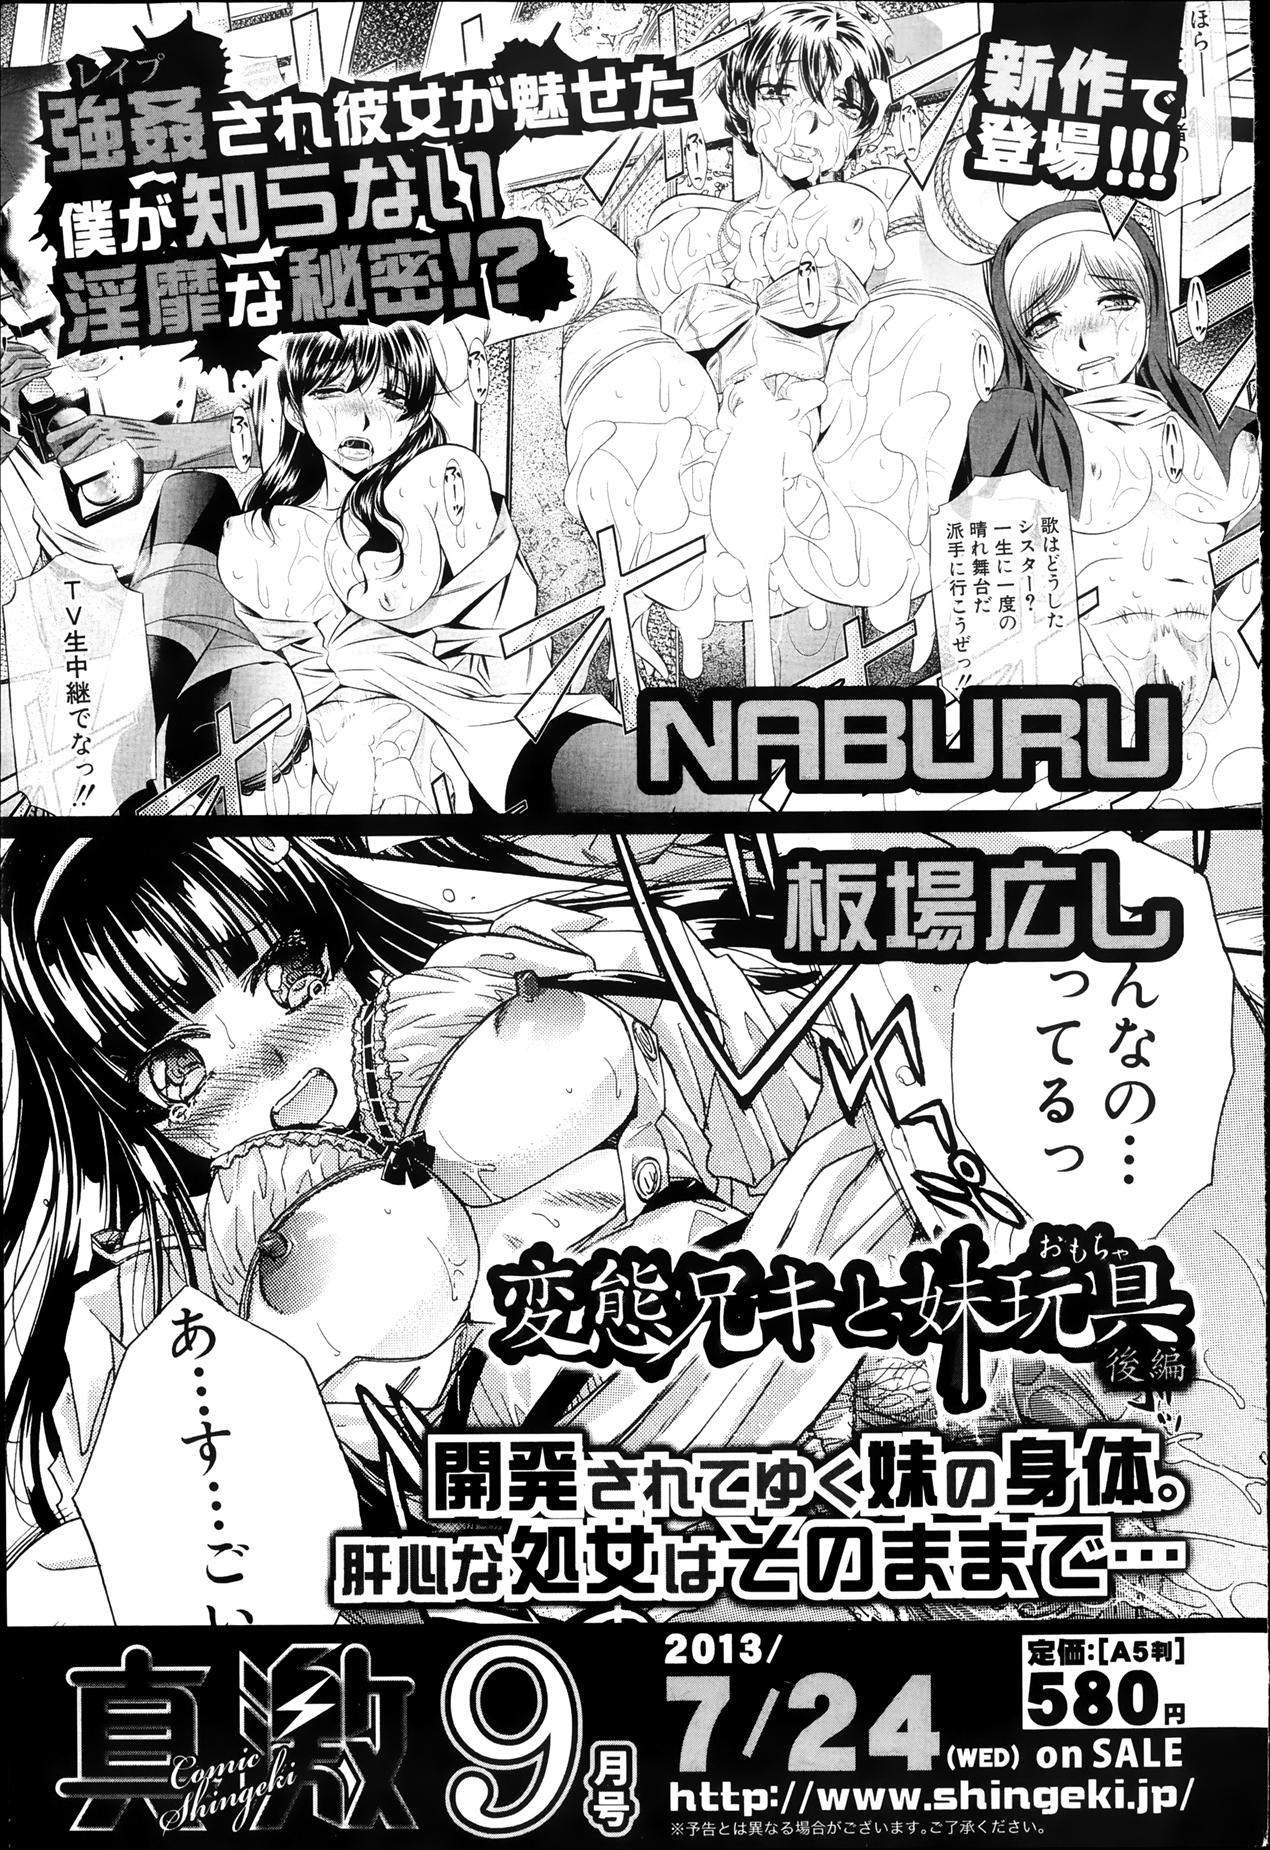 COMIC Shingeki 2013-08 360